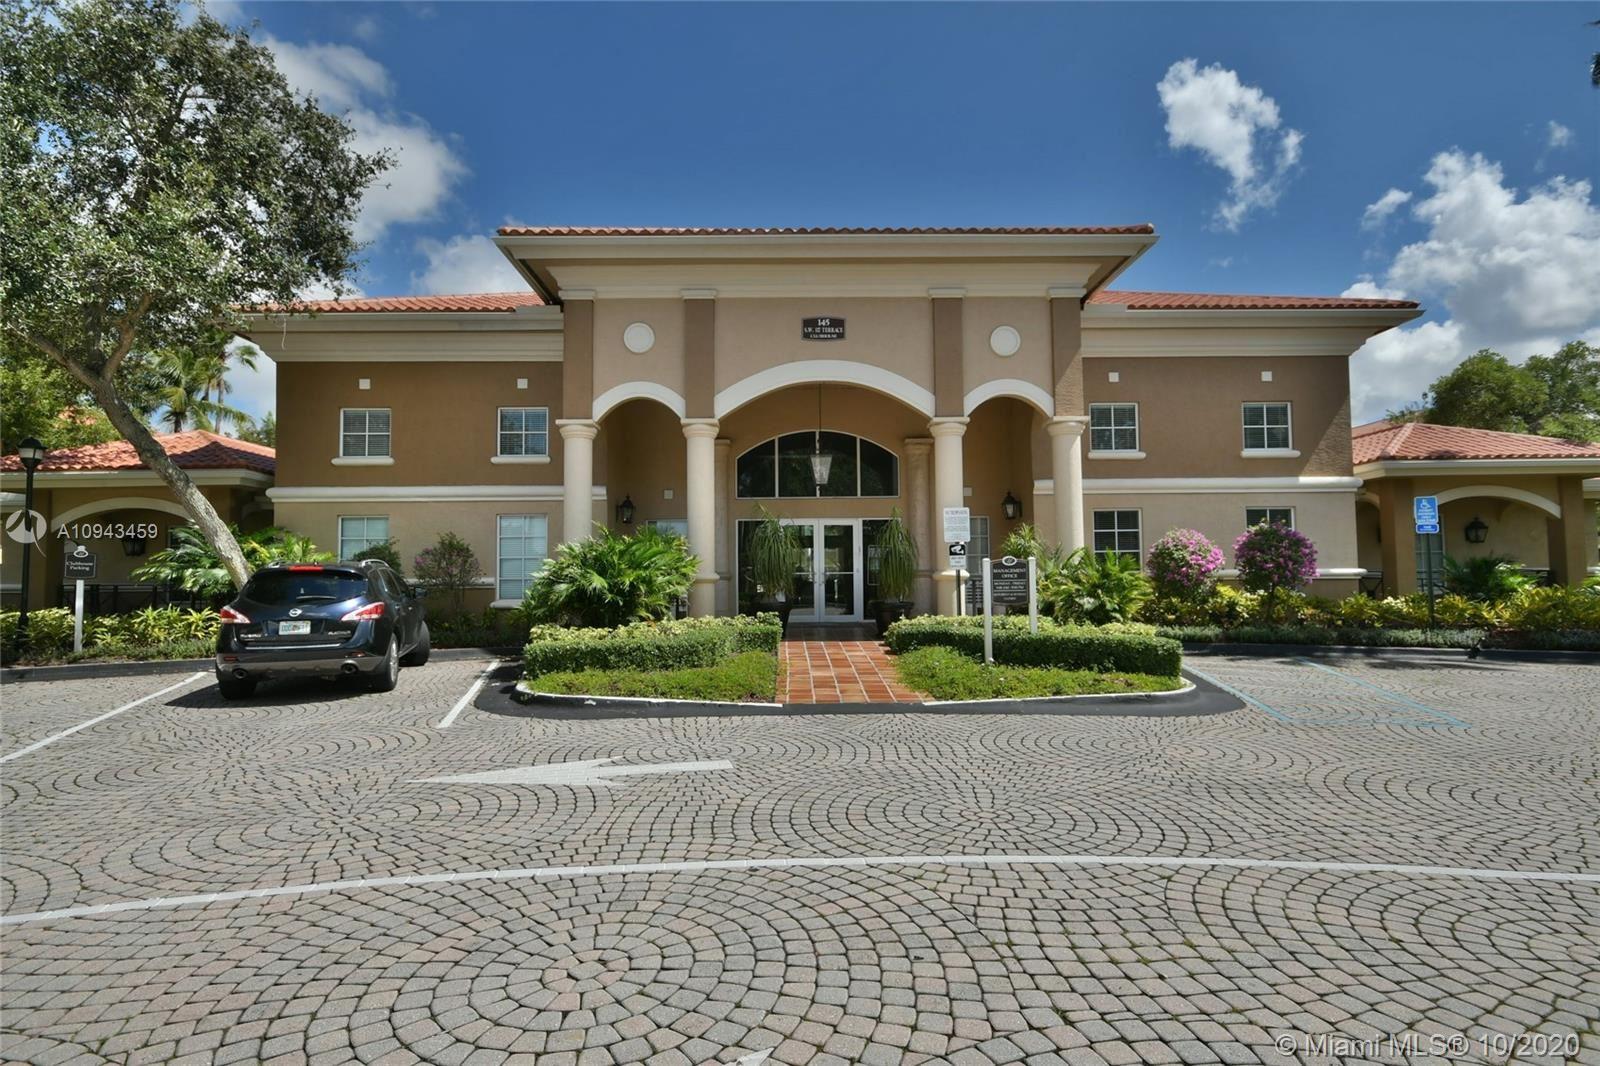 131 SW 117th Ave #8202, Pembroke Pines, FL 33025 - #: A10943459